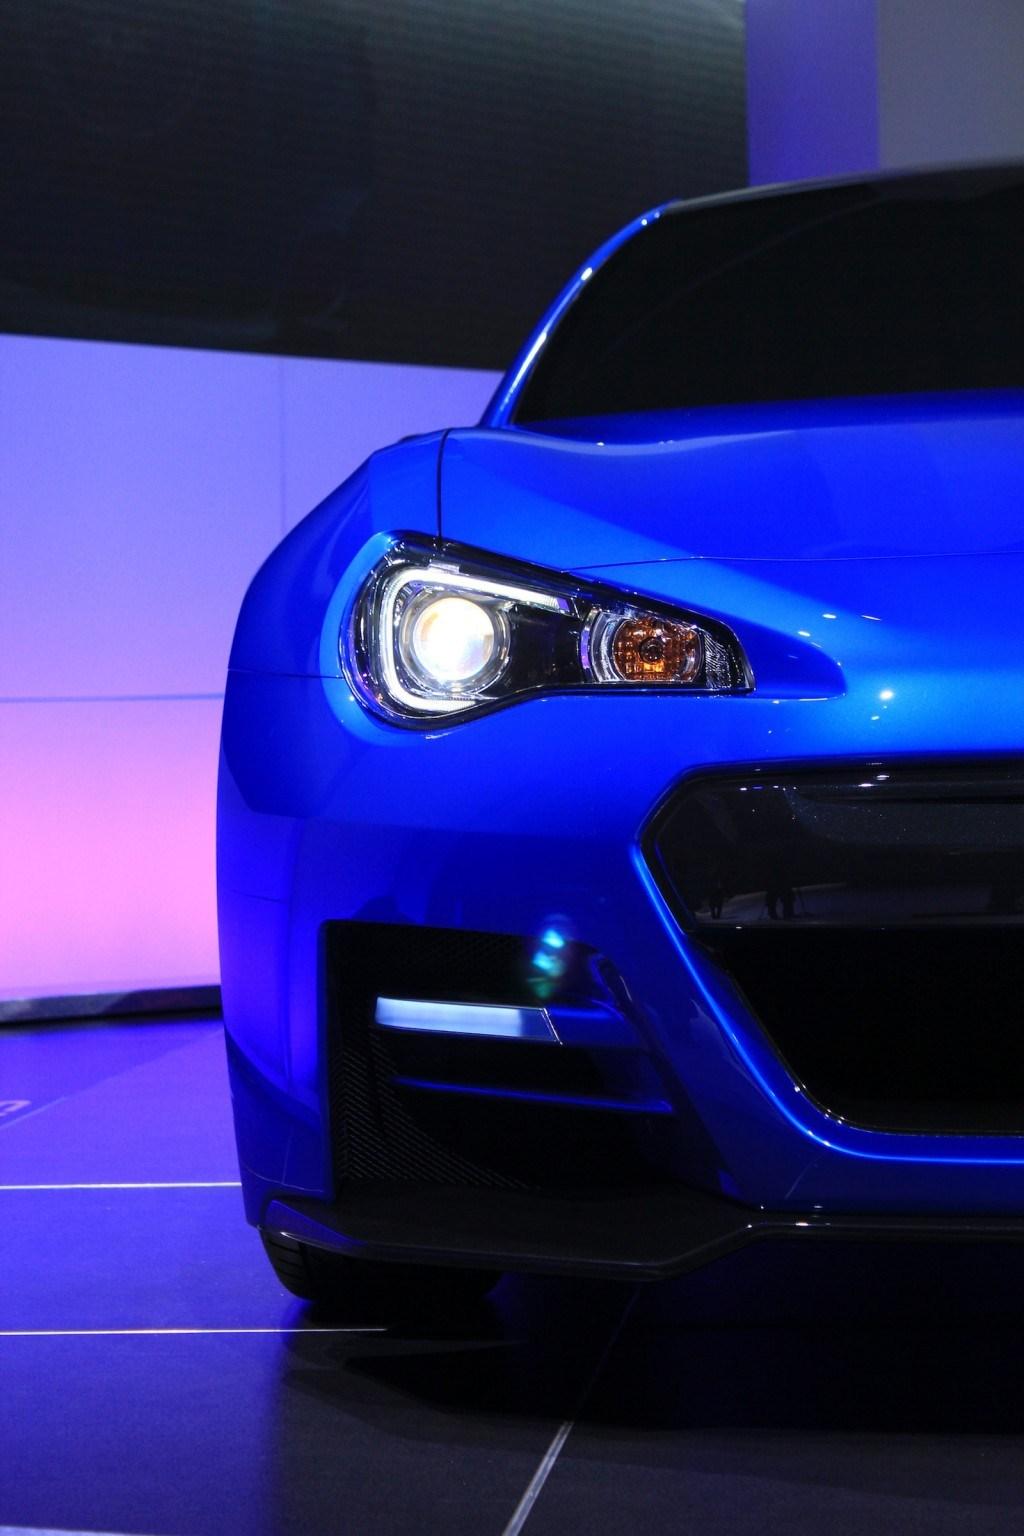 2015 Subaru BRZ Turbo Muscles Car Wallpaper